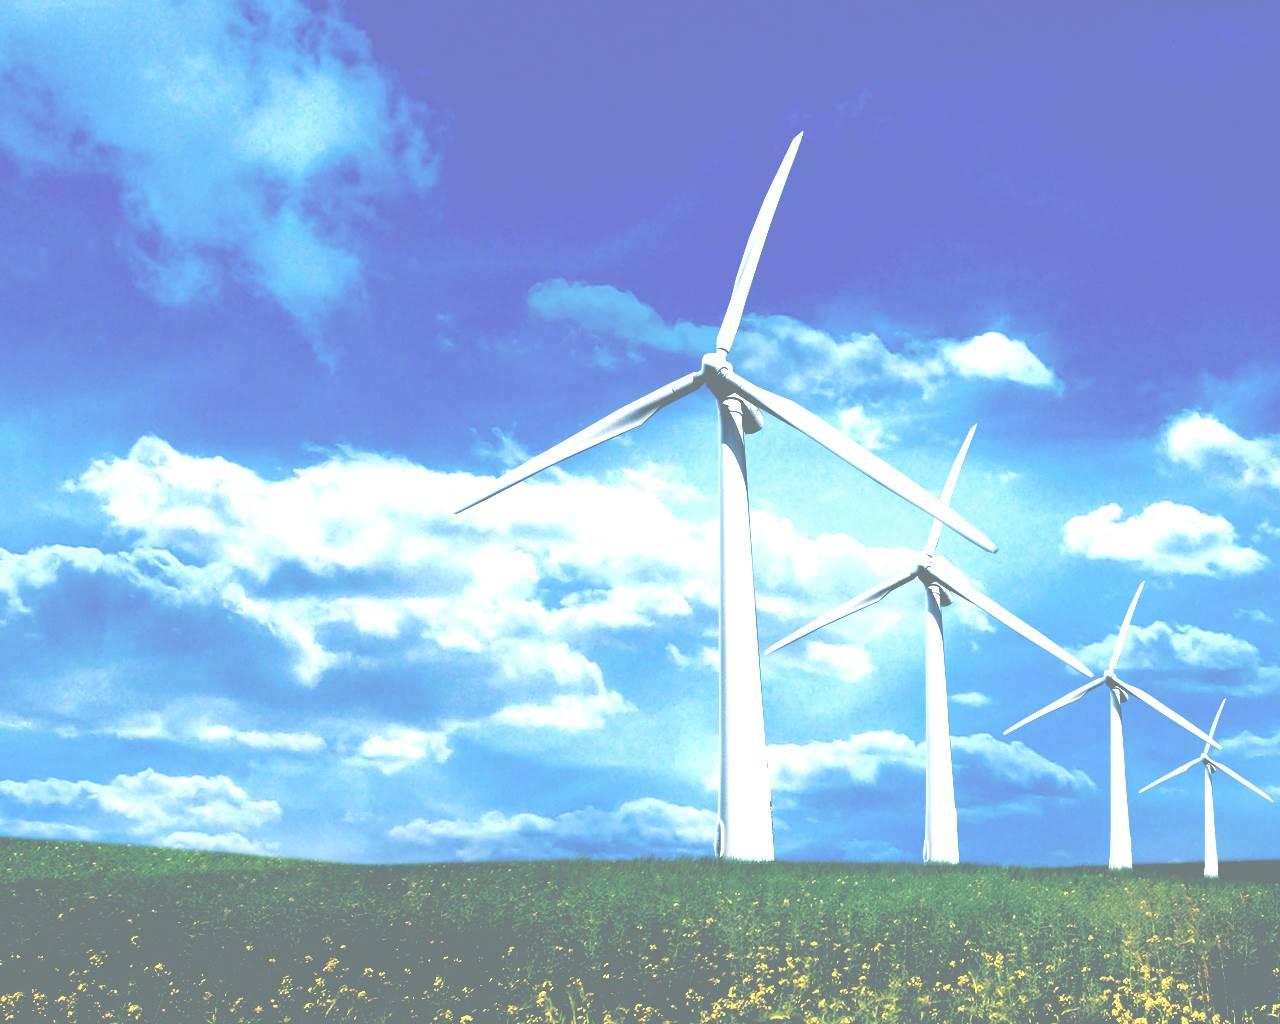 Imagenes de energia eolica 3